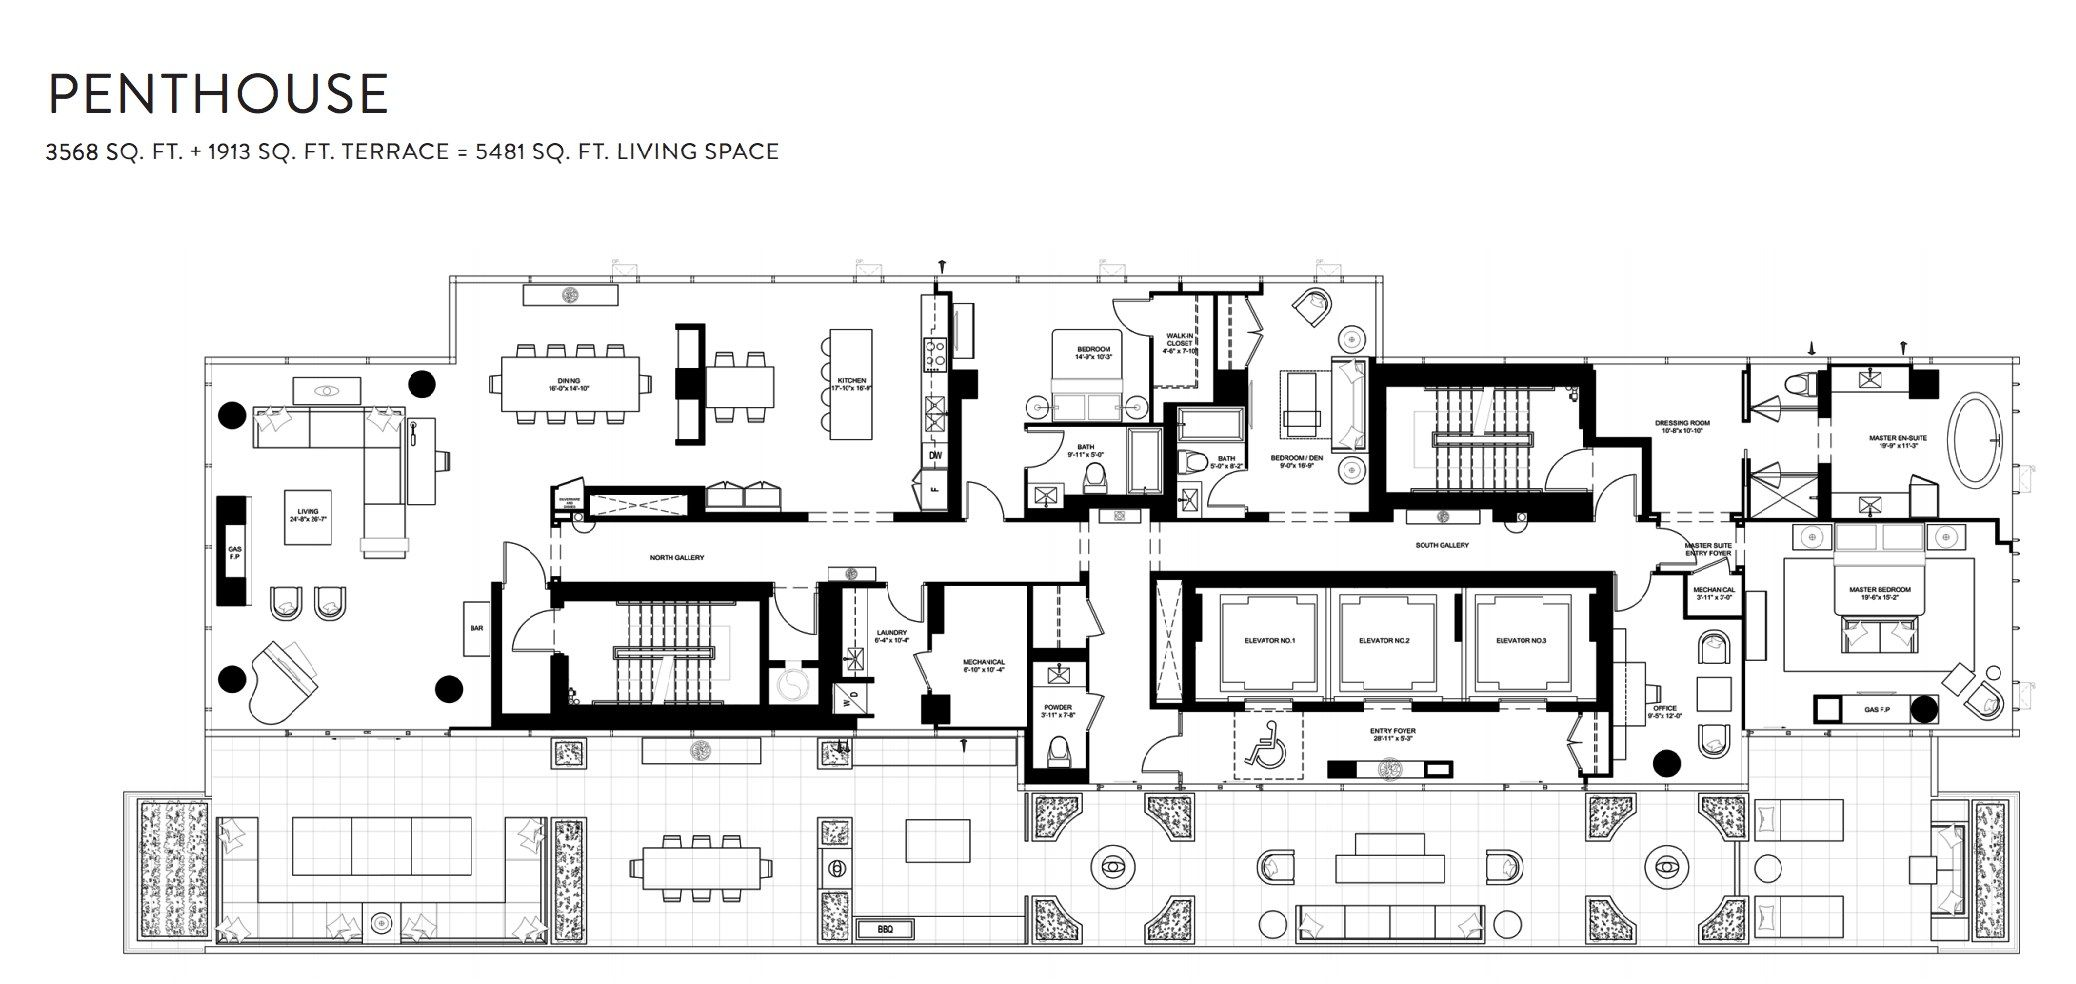 The Bond Condos Penthouse 290 Adelaide St W Toronto Floor